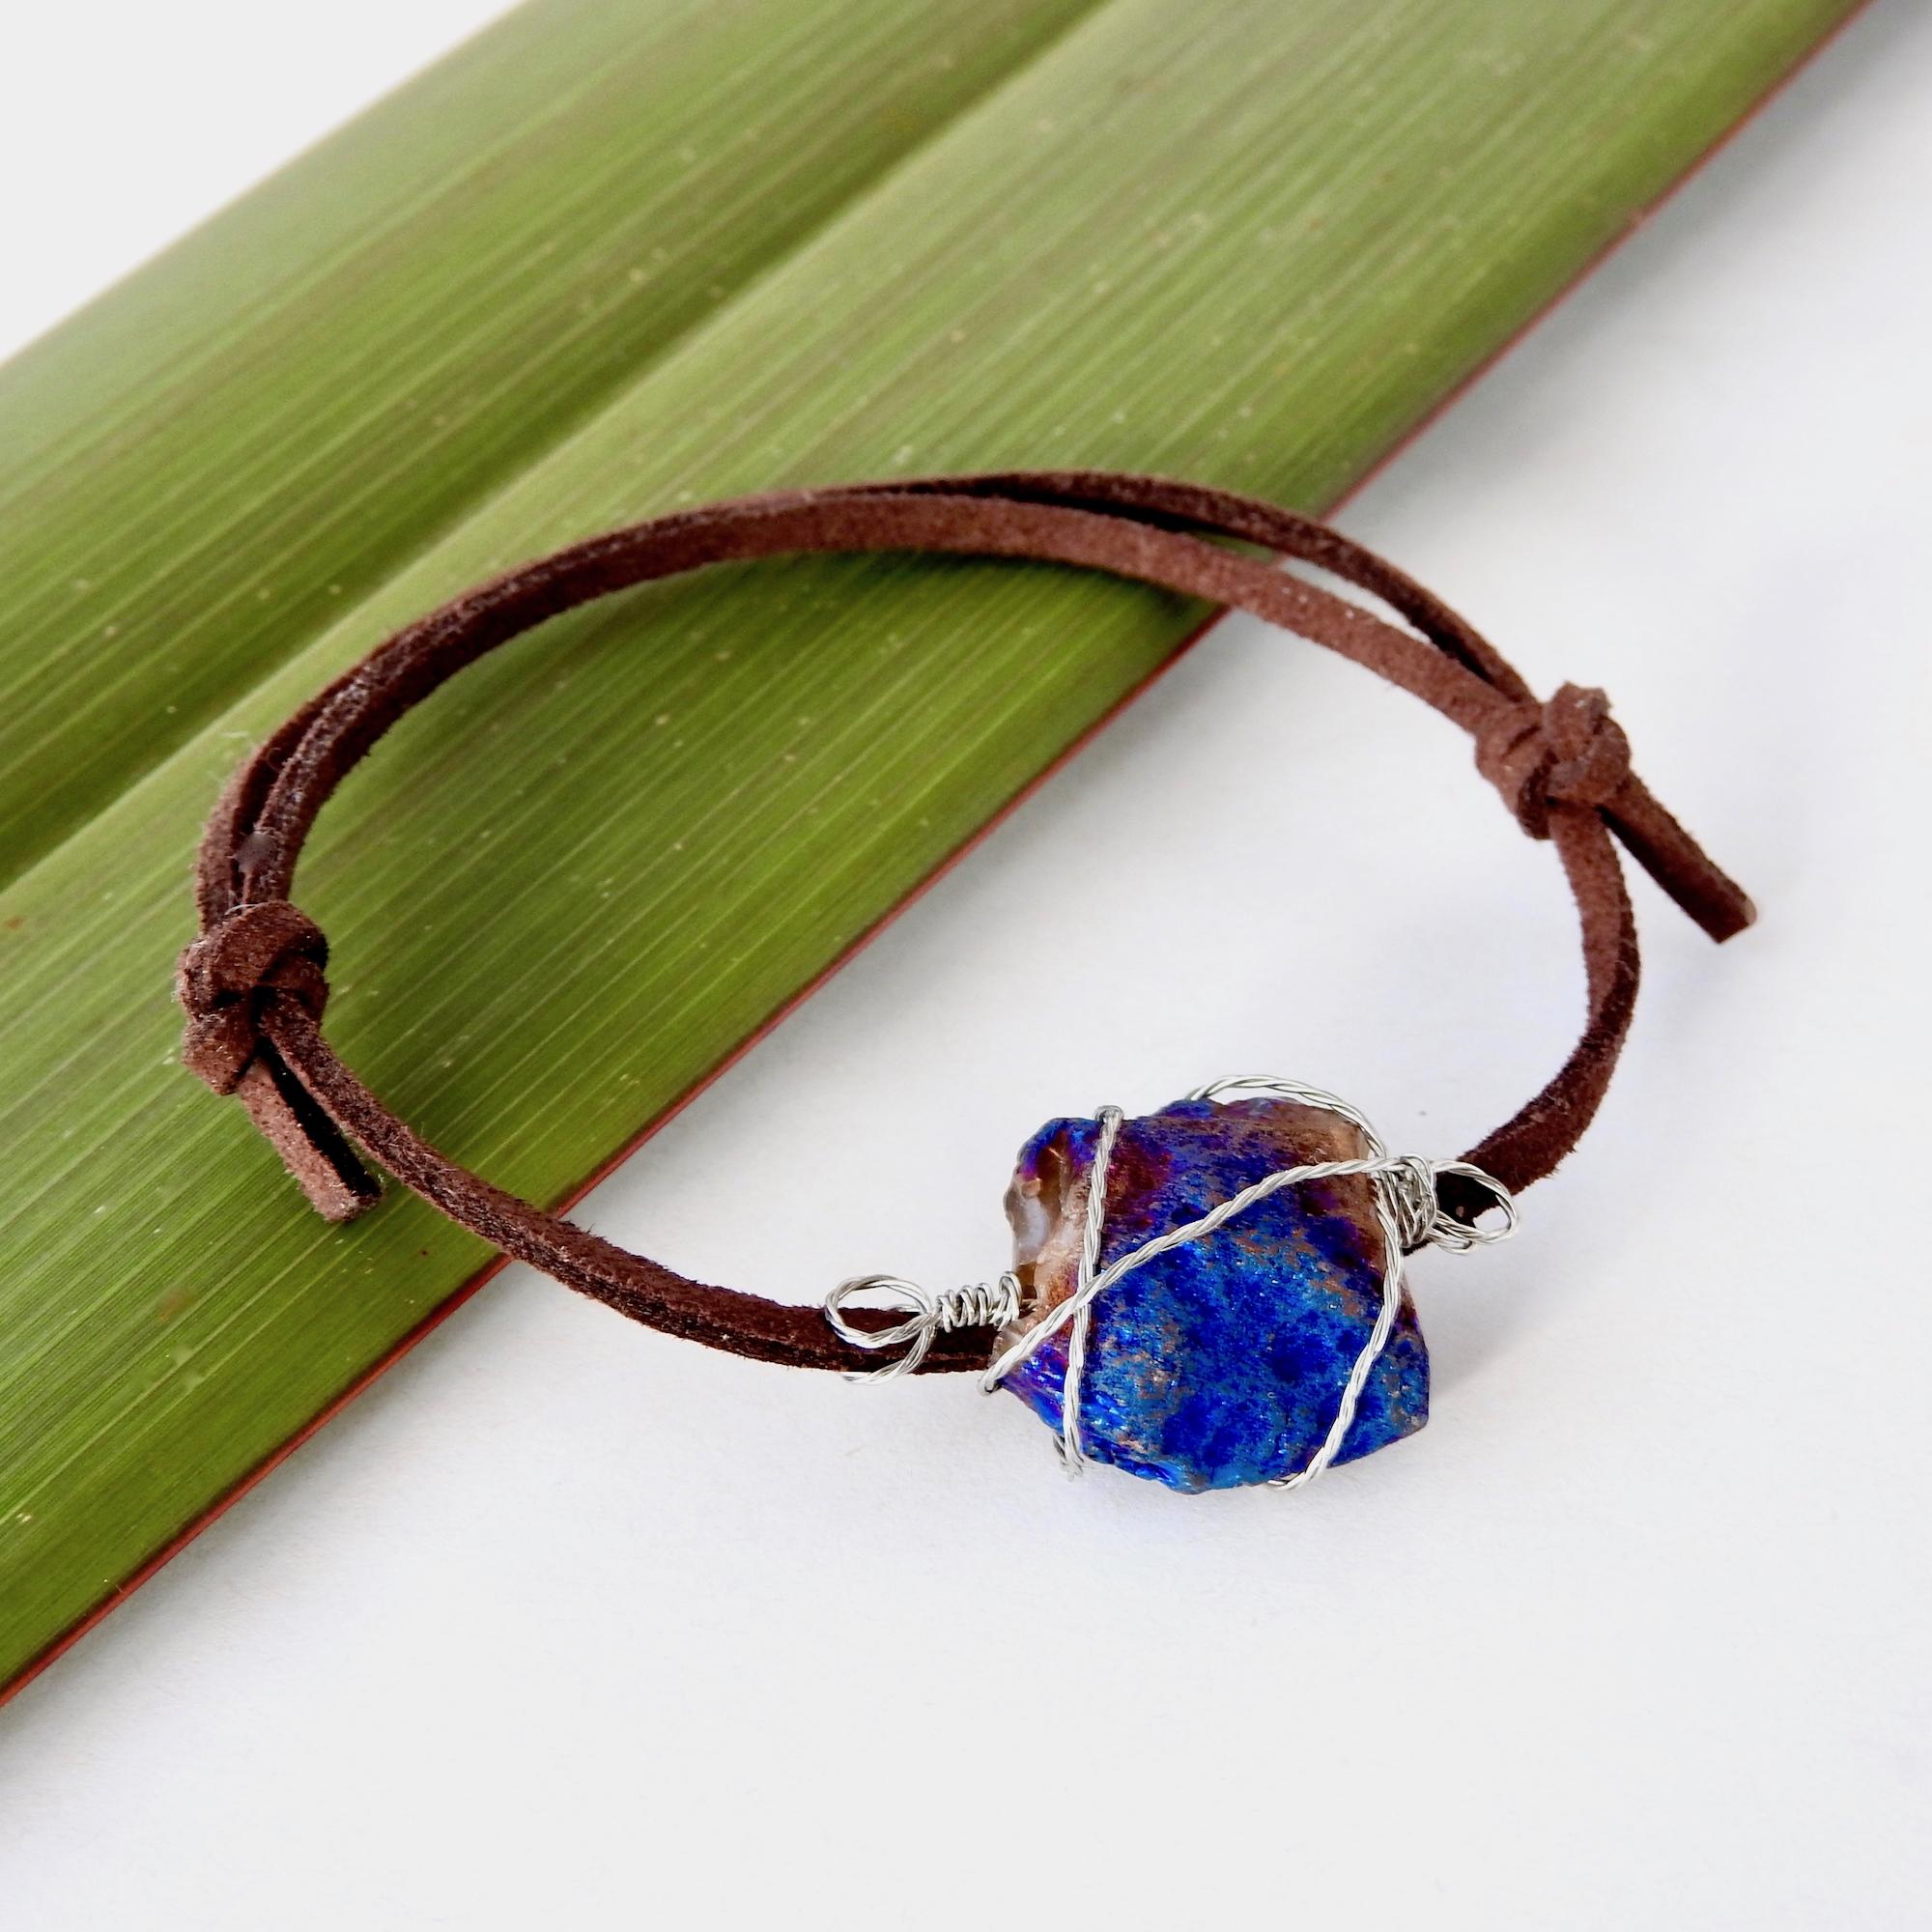 Iridescent Titanium Stone Bracelet for Men on adjustable chocolate brown suede cord